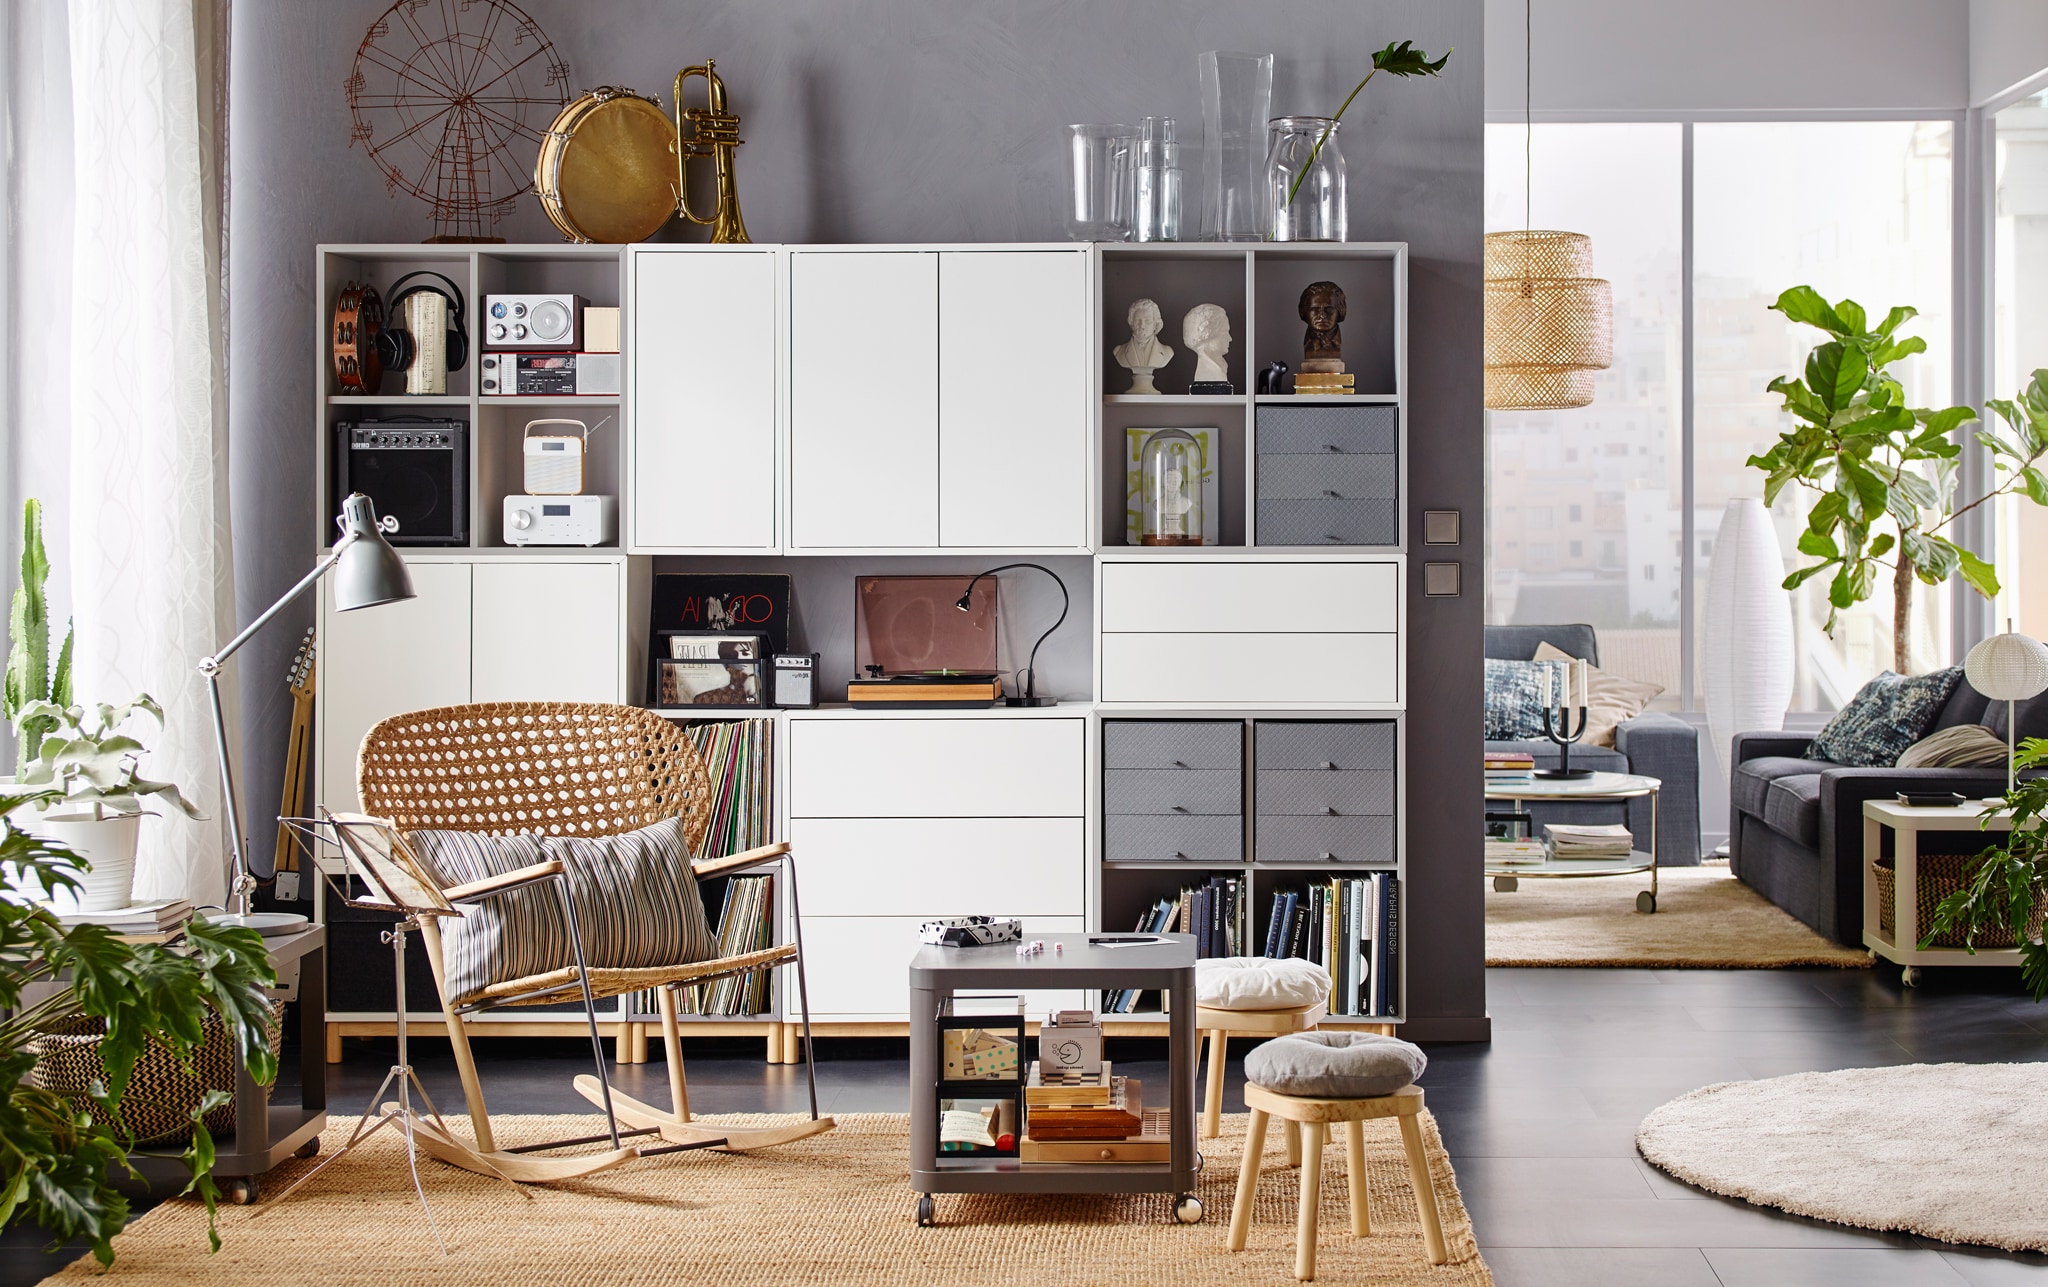 Muebles De Salon Ikea Ofertas Zwdg Salà N Muebles Para El Salà N Pra Online Ikea